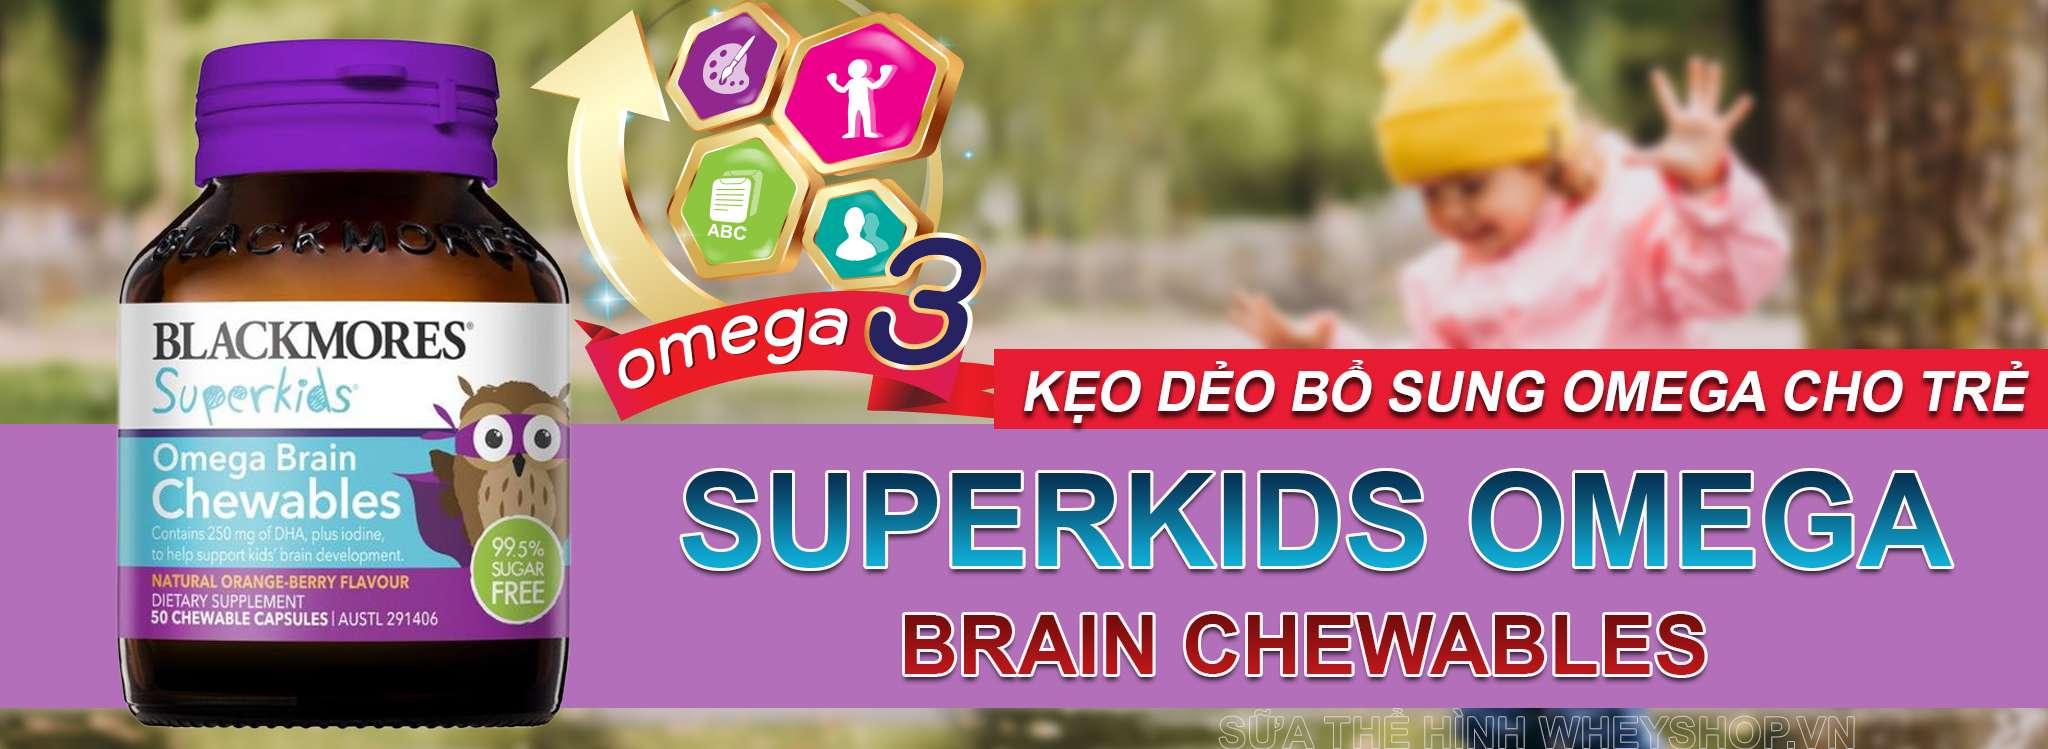 Blackmores Superkids Omega Brain Chewables 50 vien gia re ha noi tphcm1